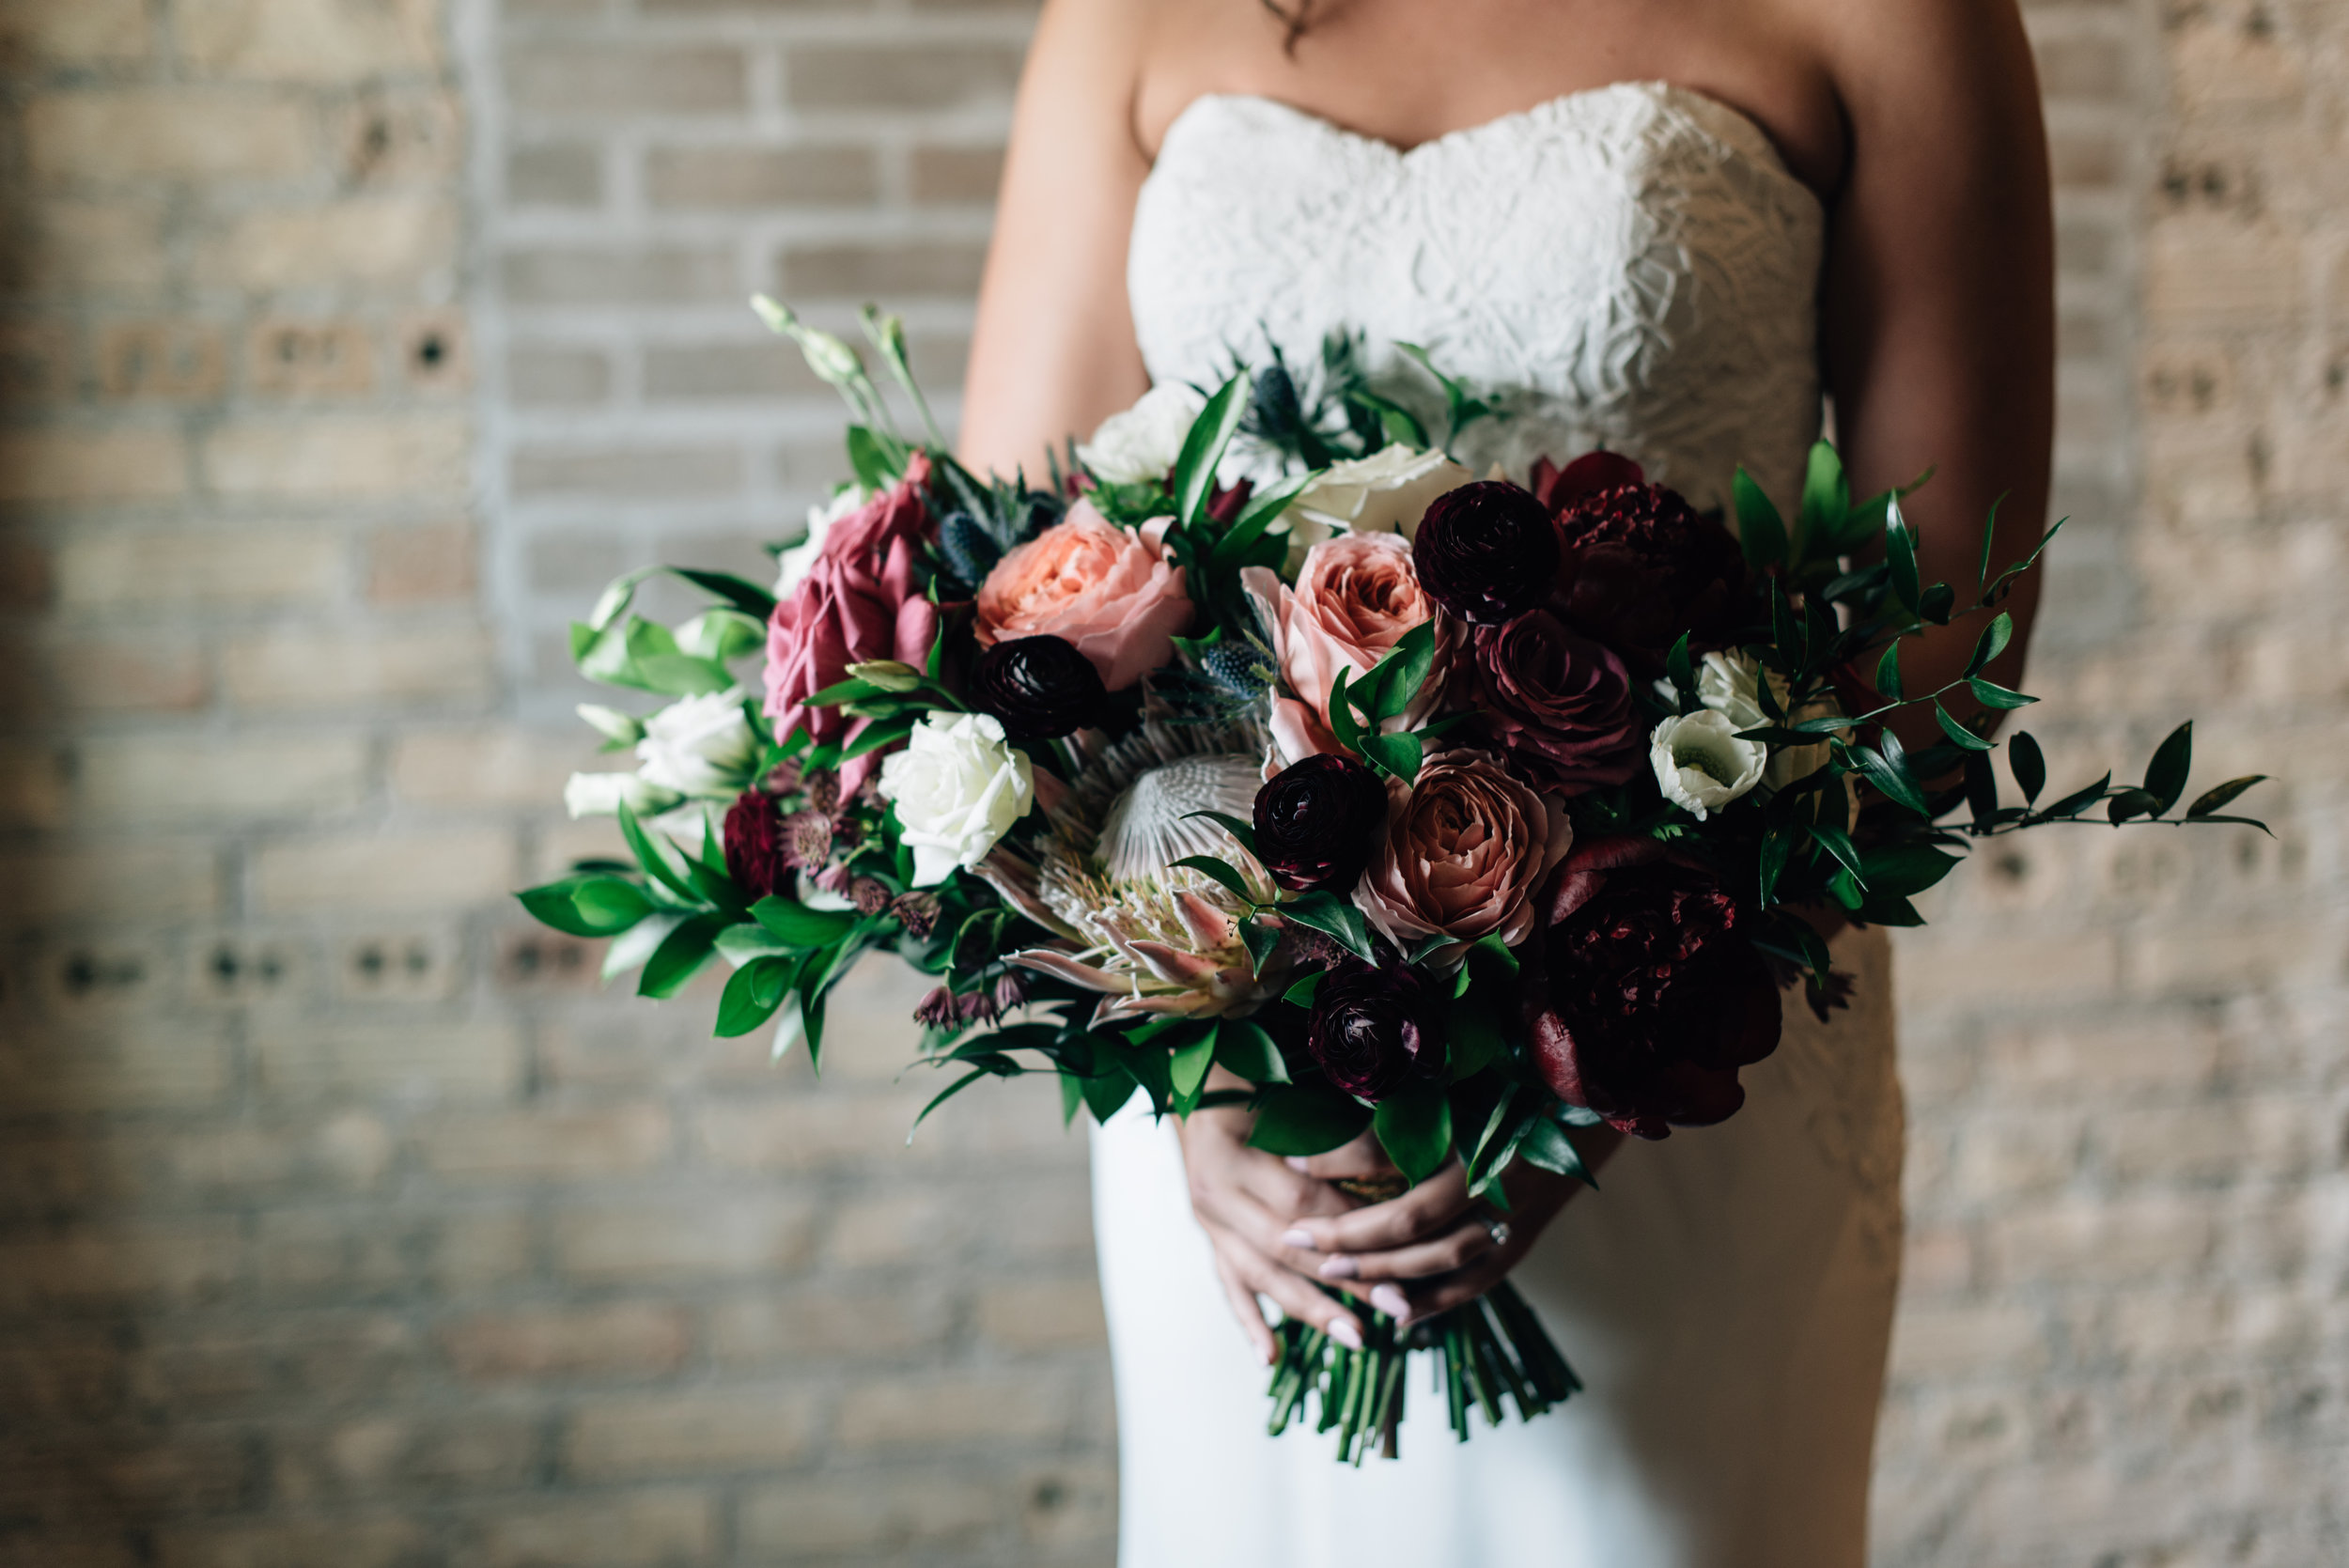 industrial-wedding-minneapolis-photographer-1-3.jpg